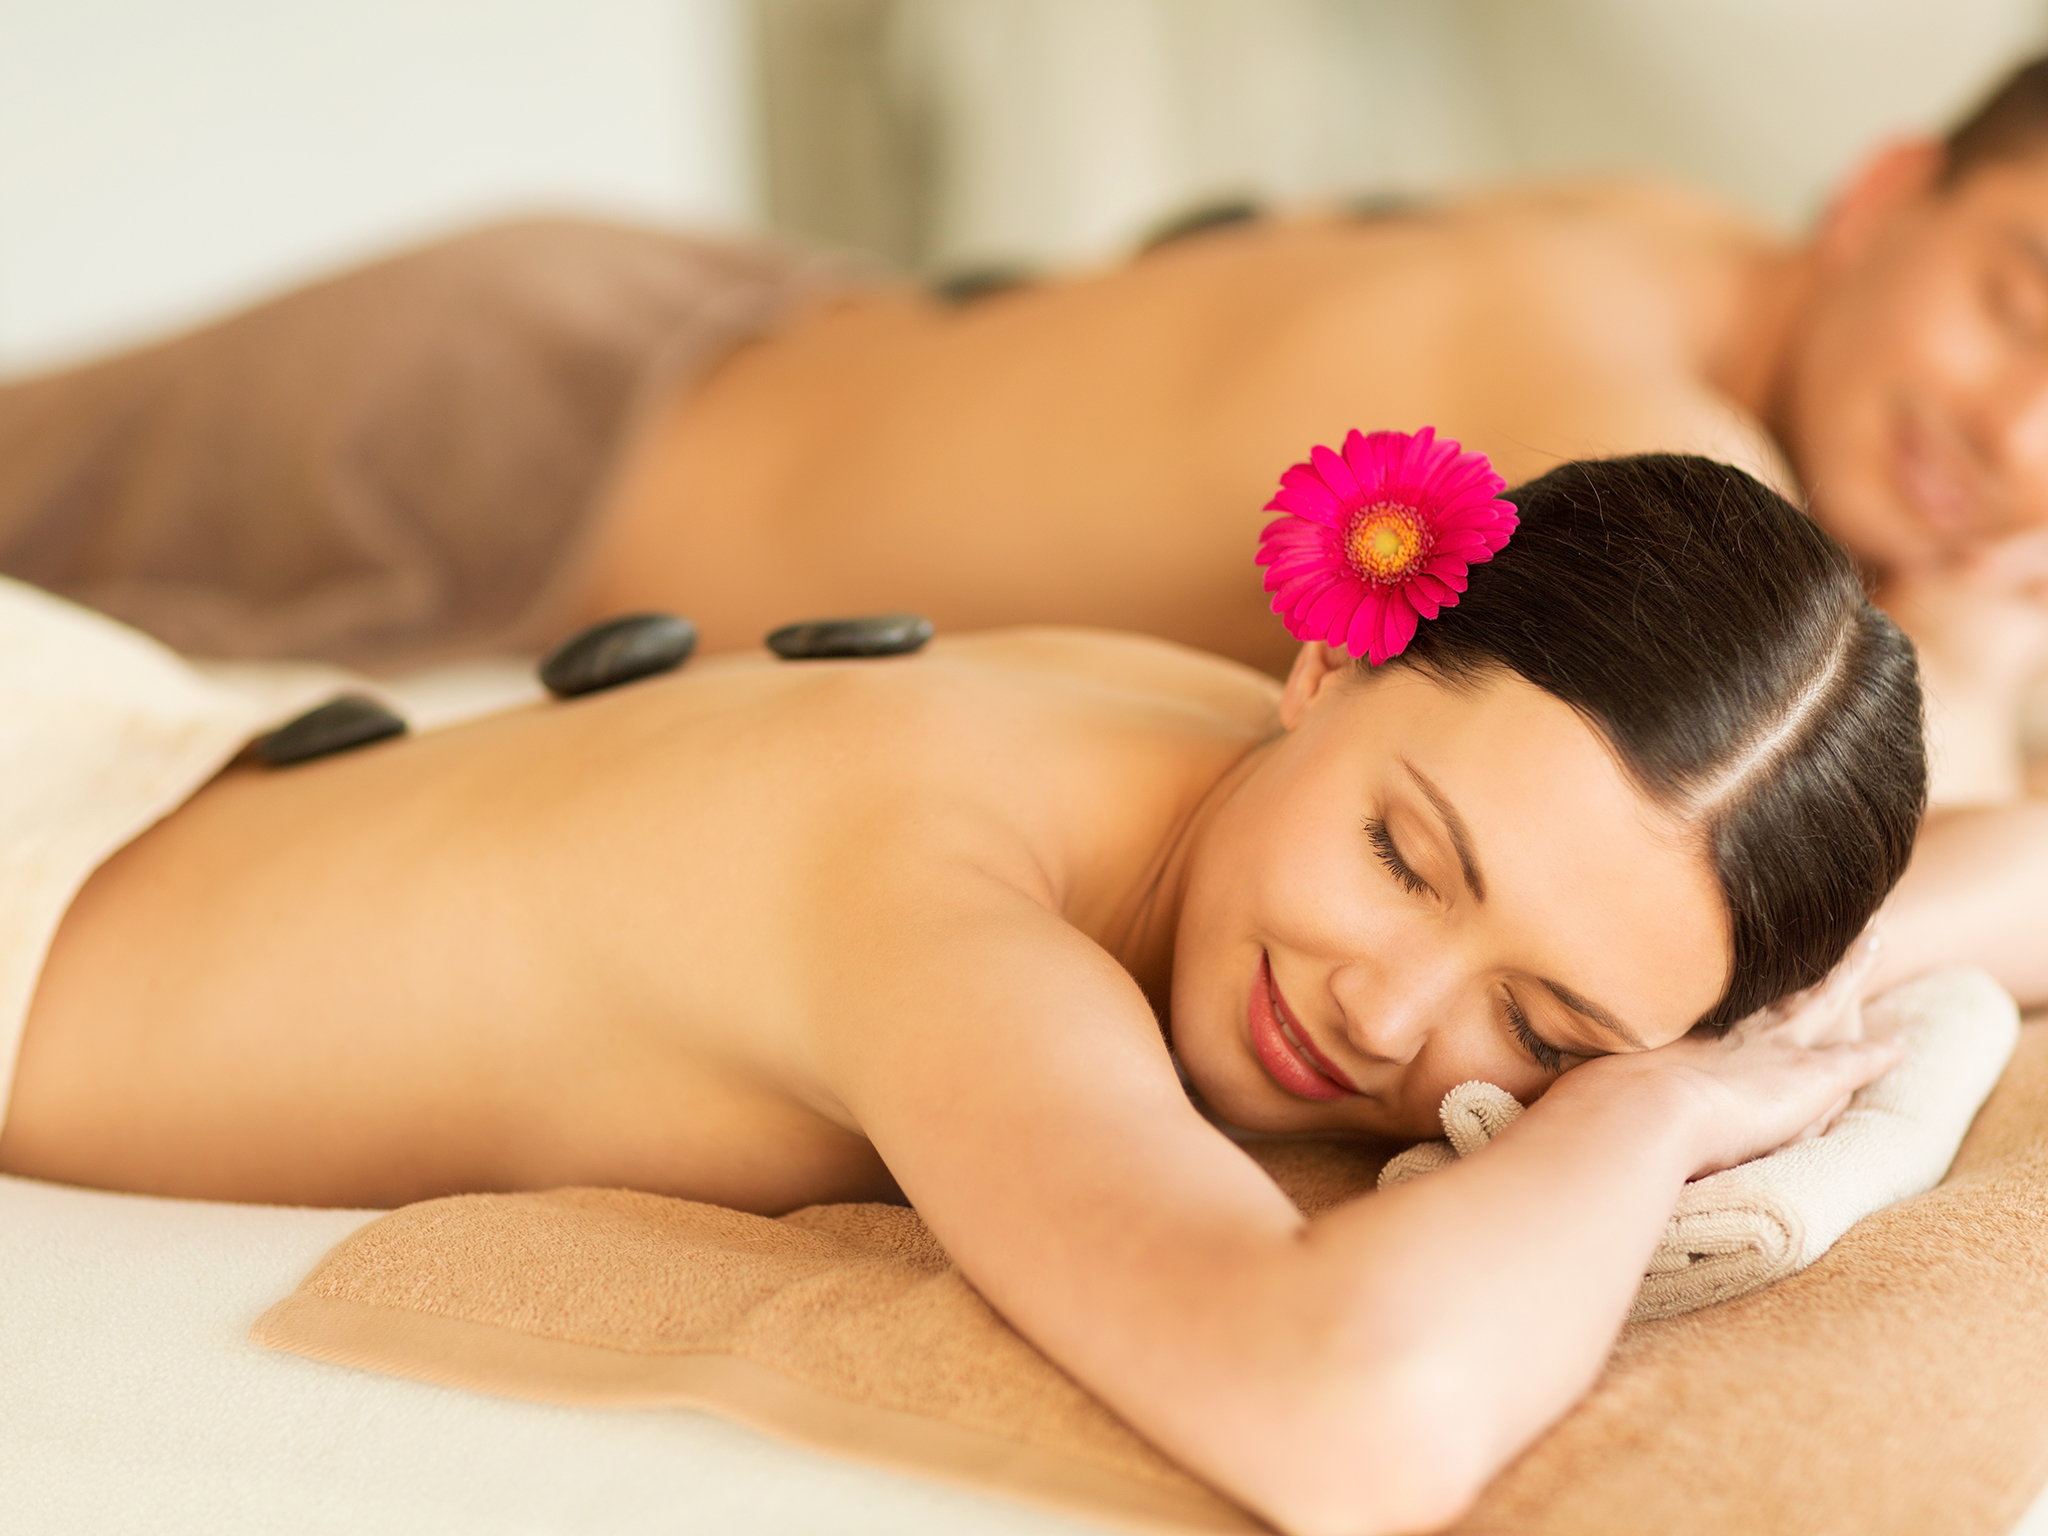 Pasa un día de spa en pareja, ideal para que ambos se relajen